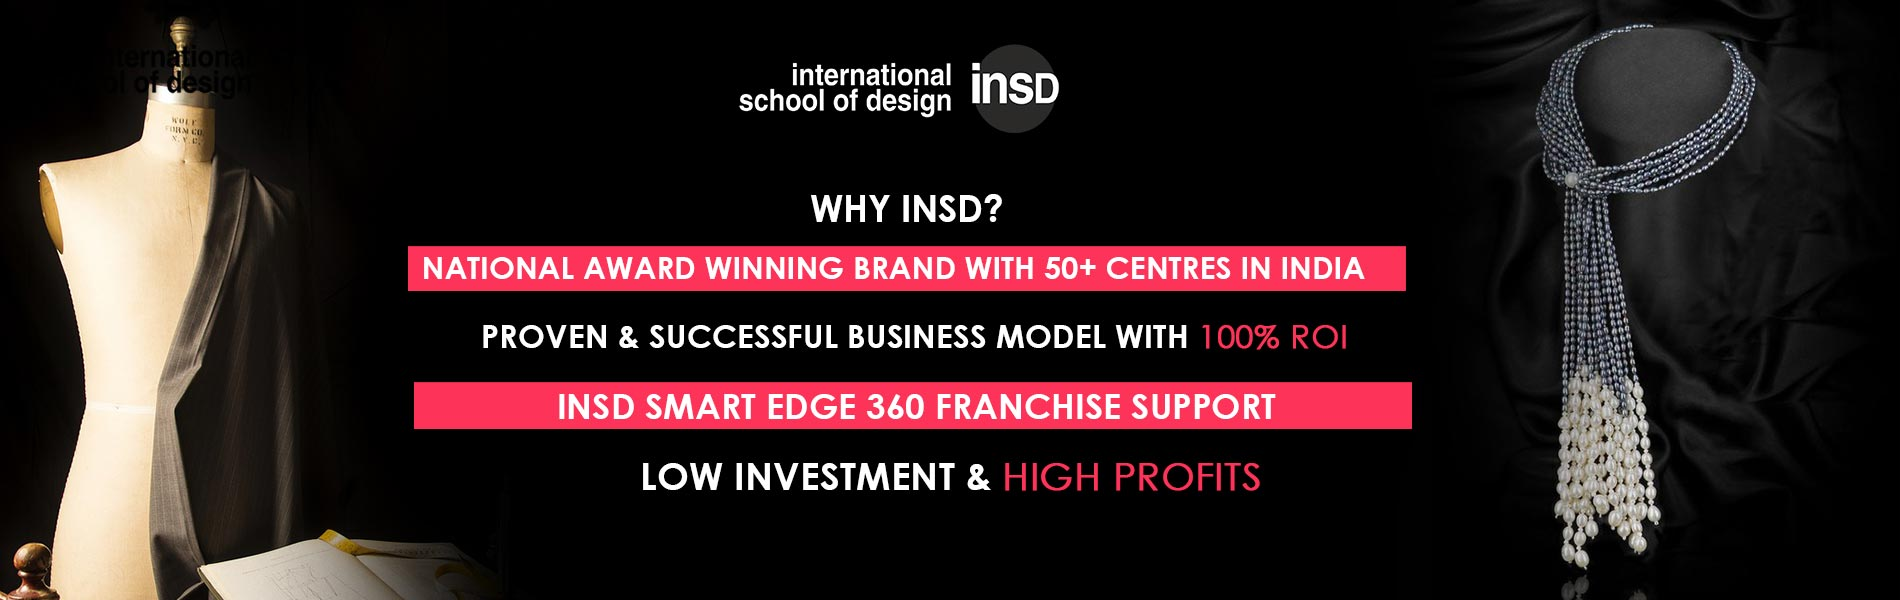 INTERNATIONAL SCHOOL OF DESIGN